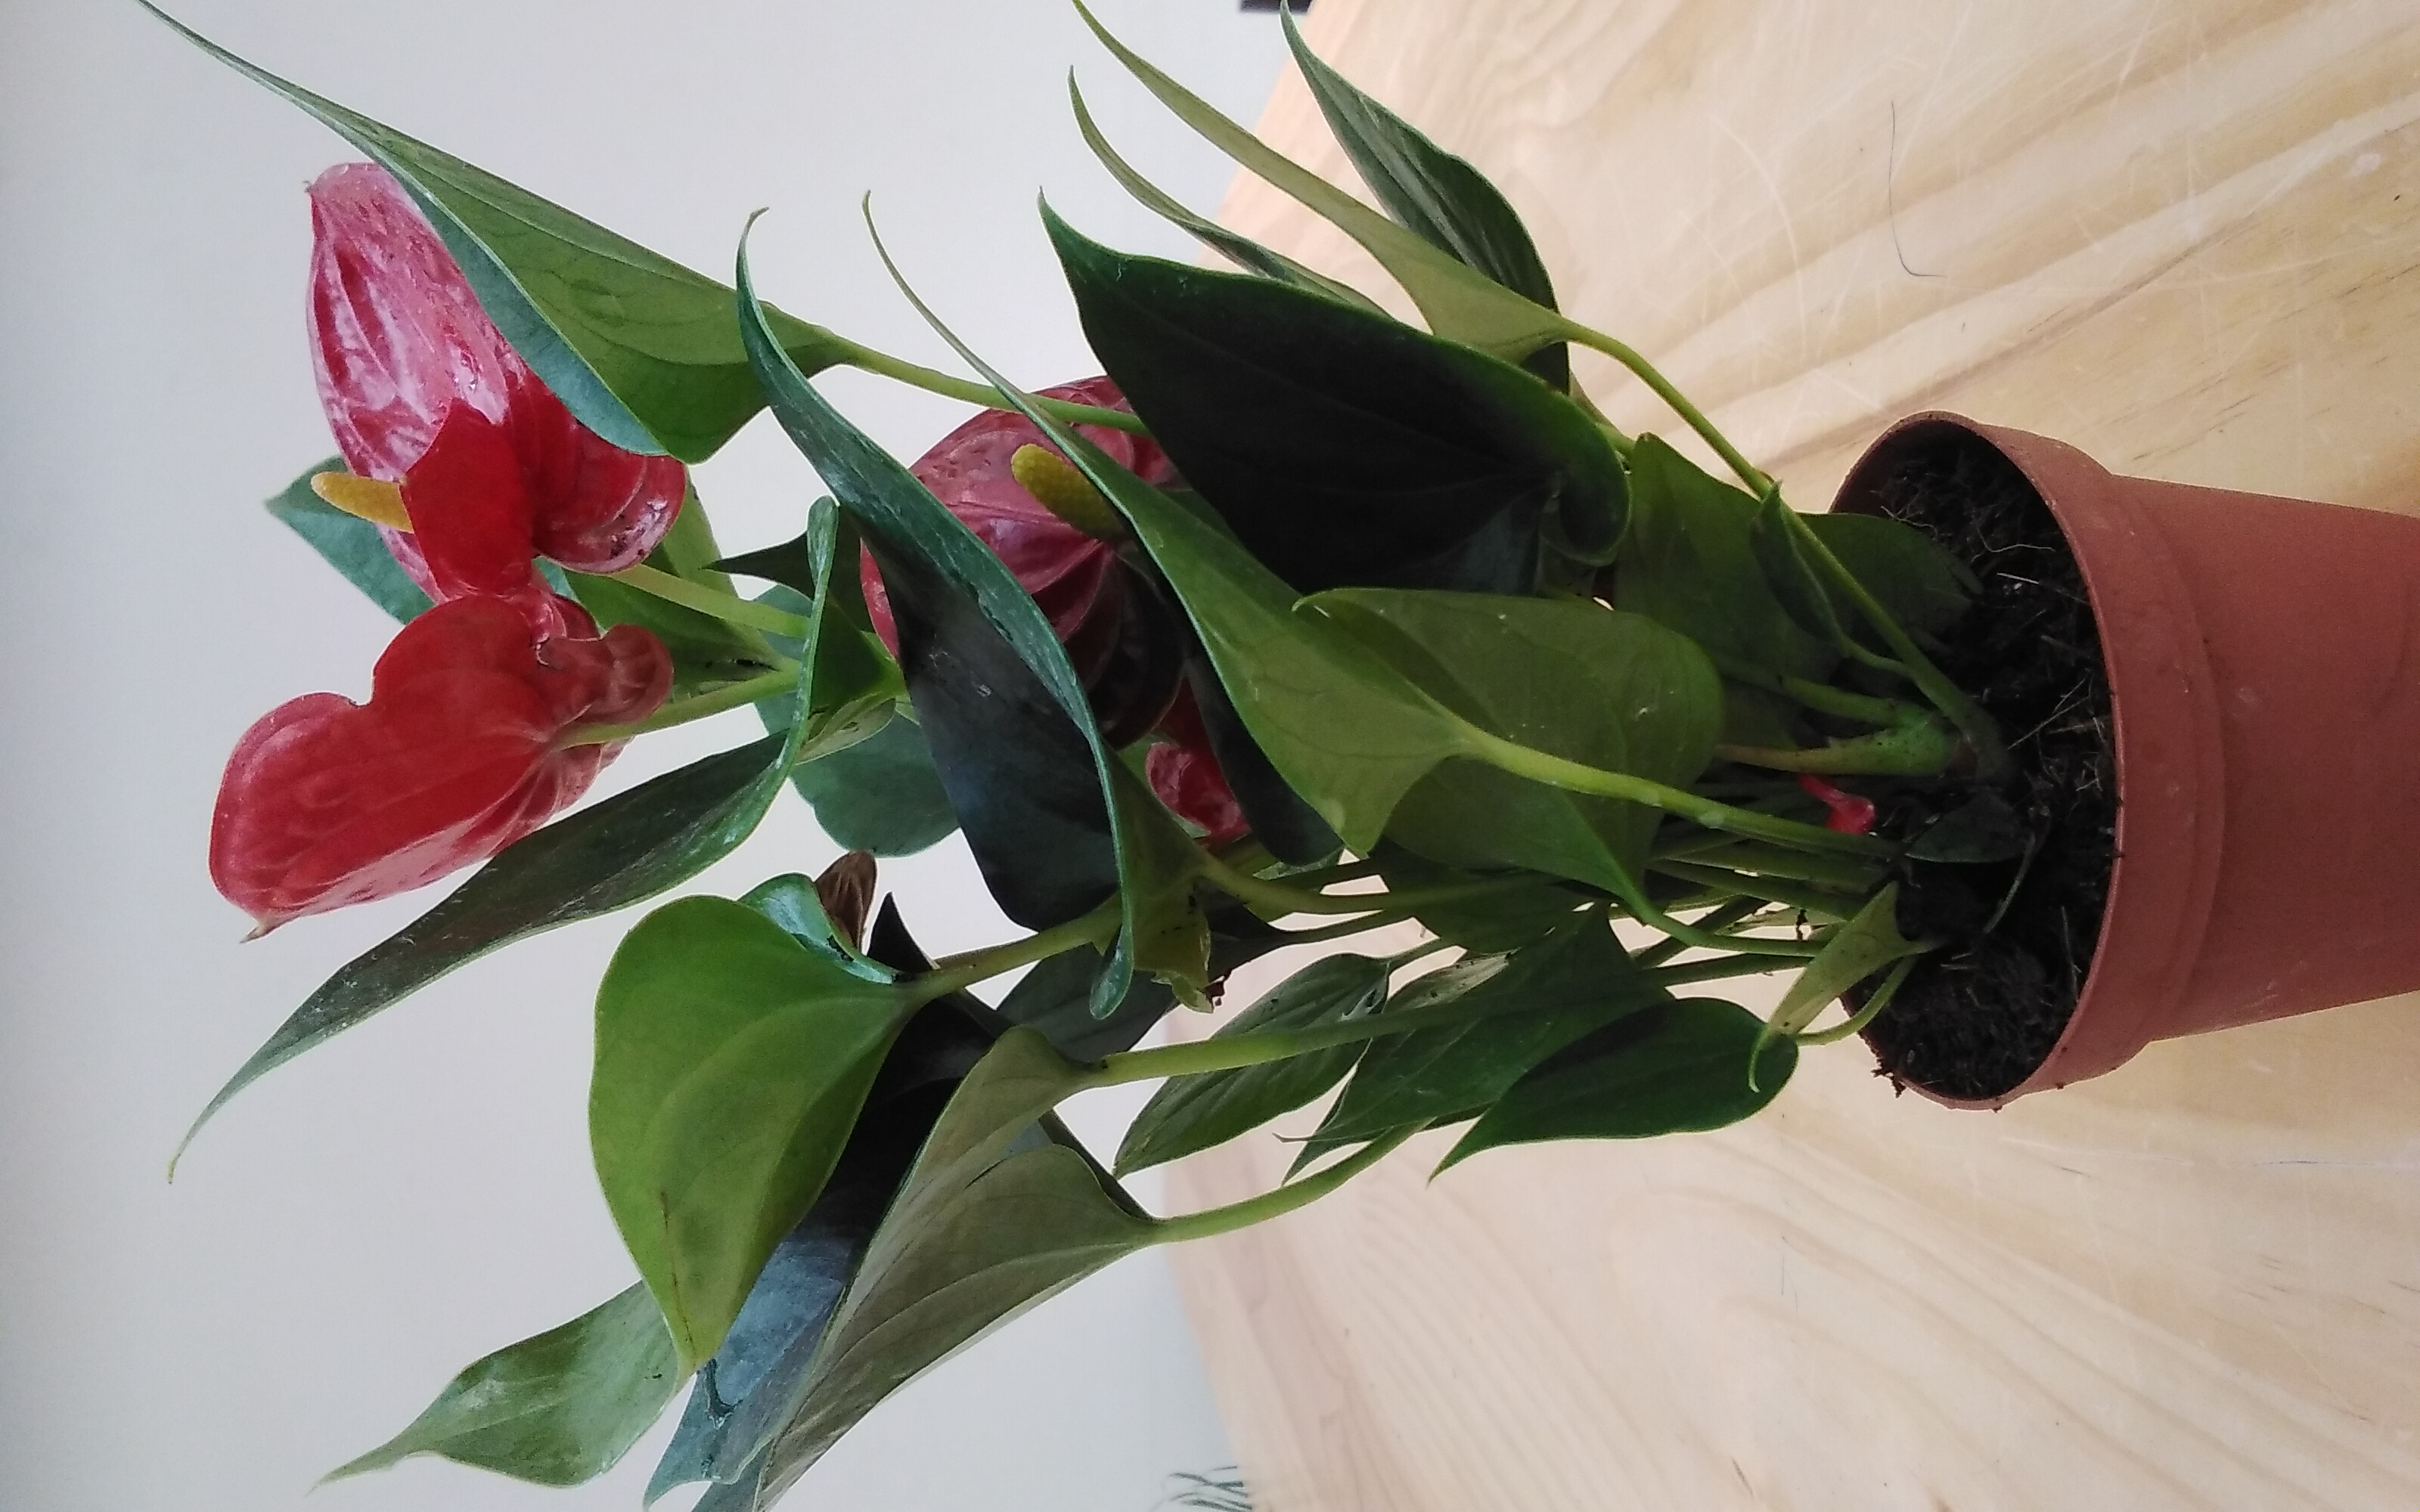 Anthurium A. Baby Arisa Red 'Indoor Plants'